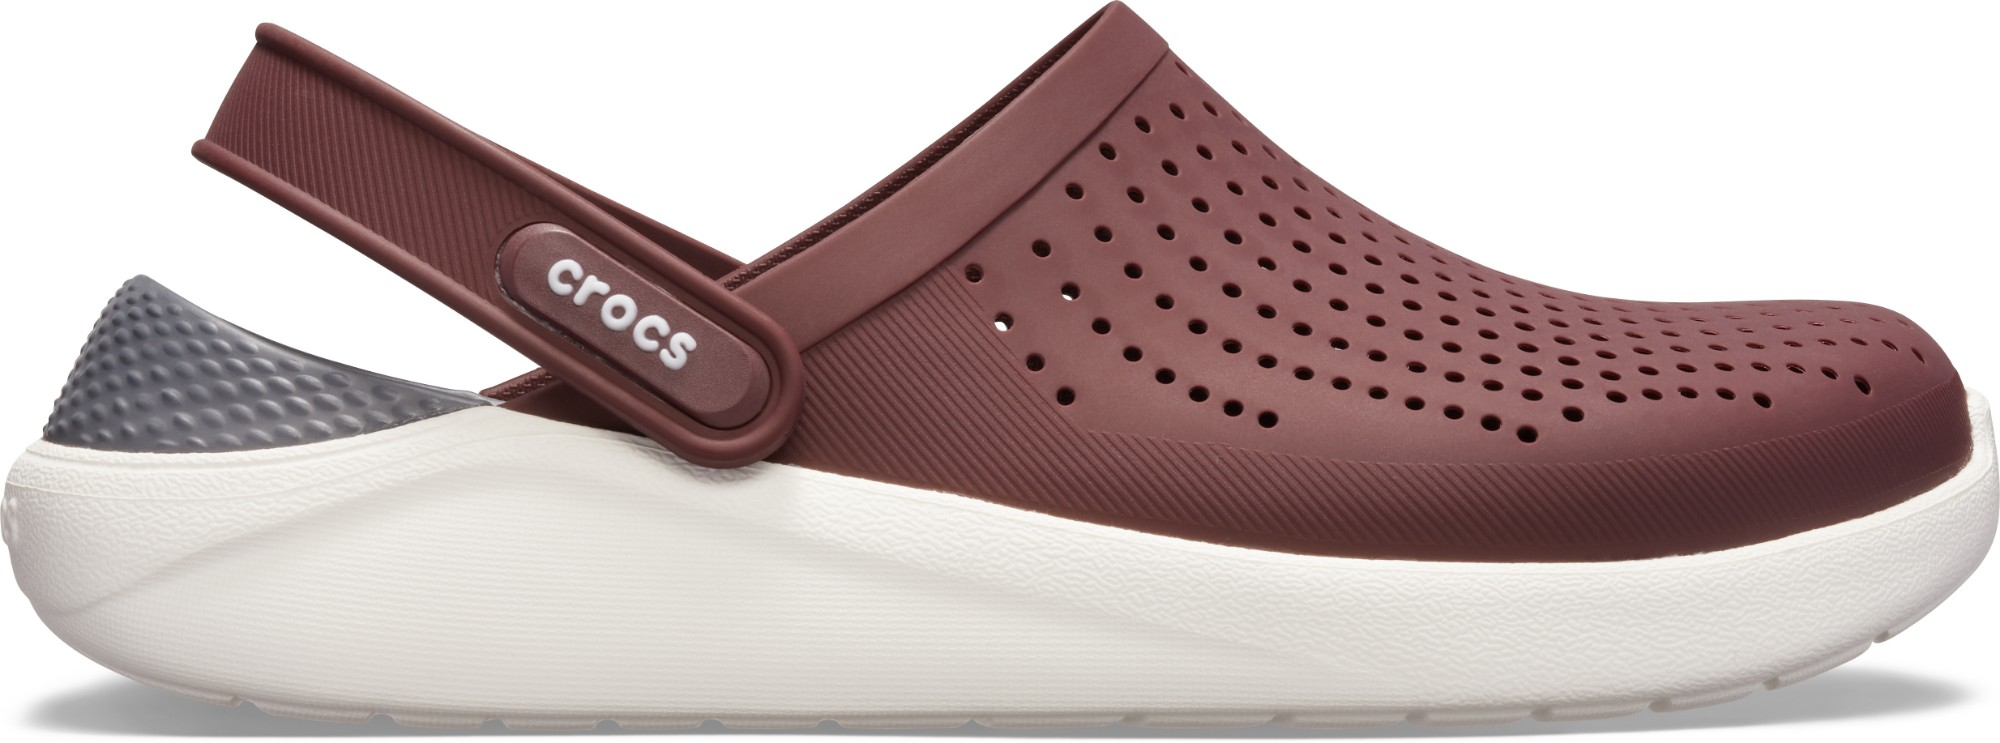 Crocs™ LiteRide Clog Burgundy/White 41